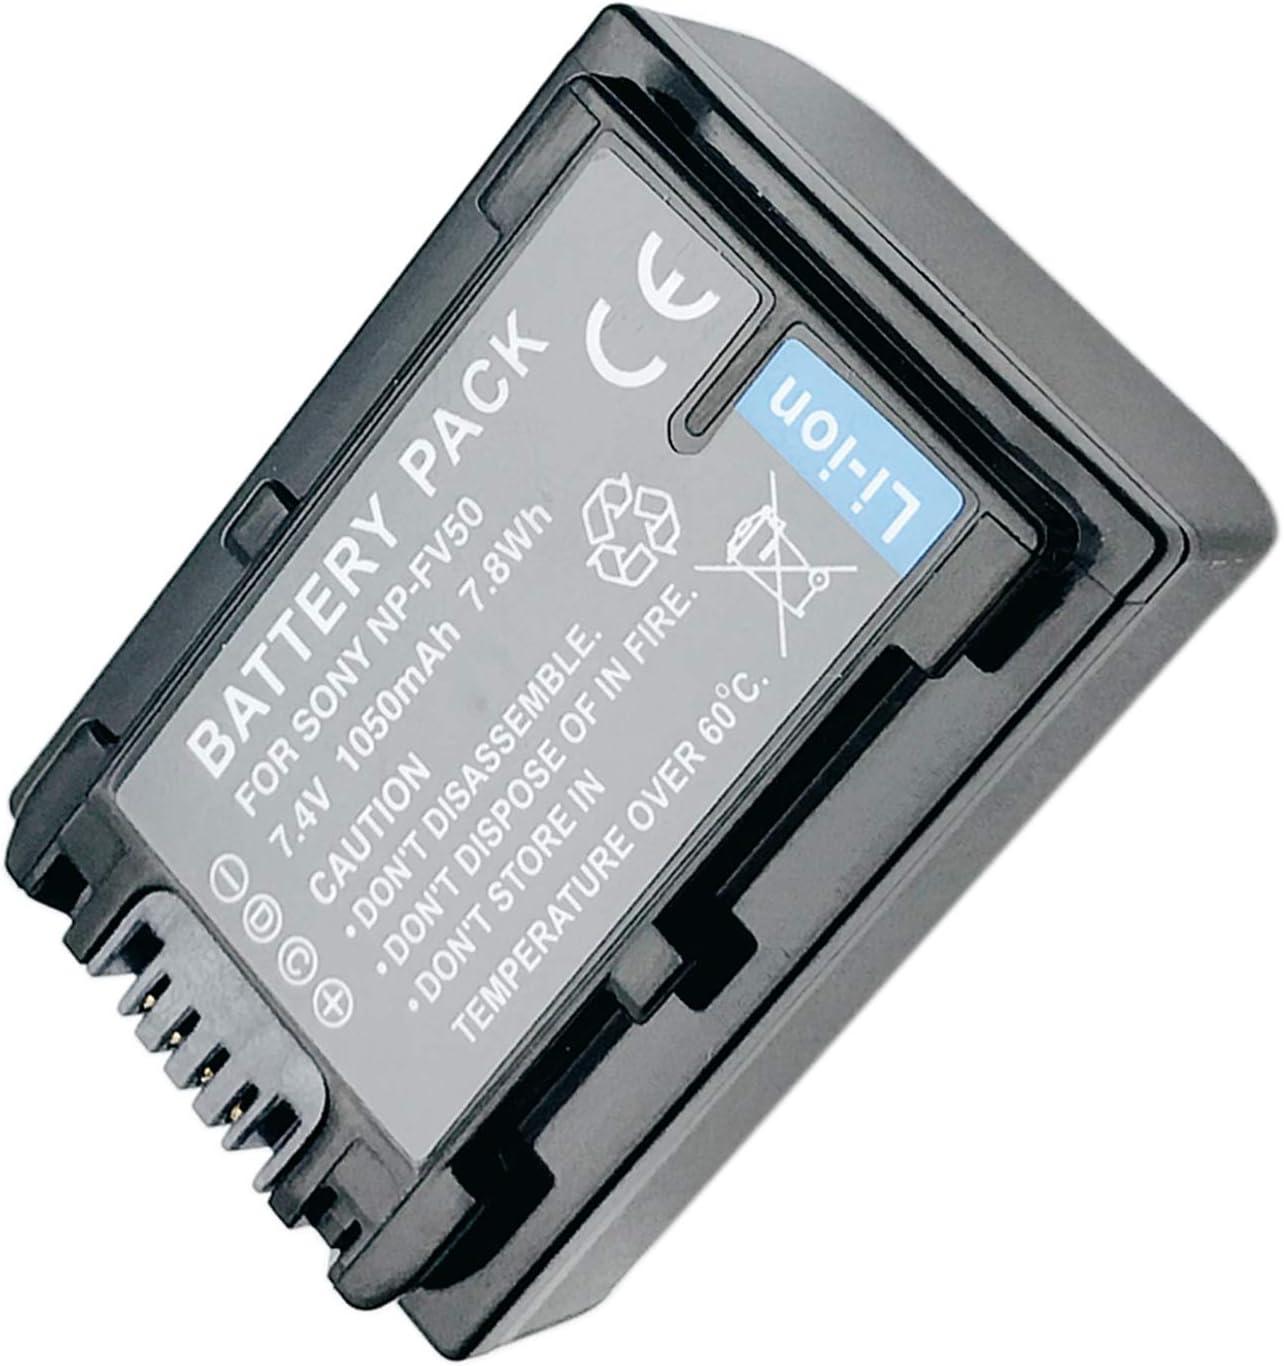 NEX-VG20E Battery Pack for Sony NEX-VG10 NEX-VG10E NEX-VG20 NEX-VG20H Handycam Camcorder